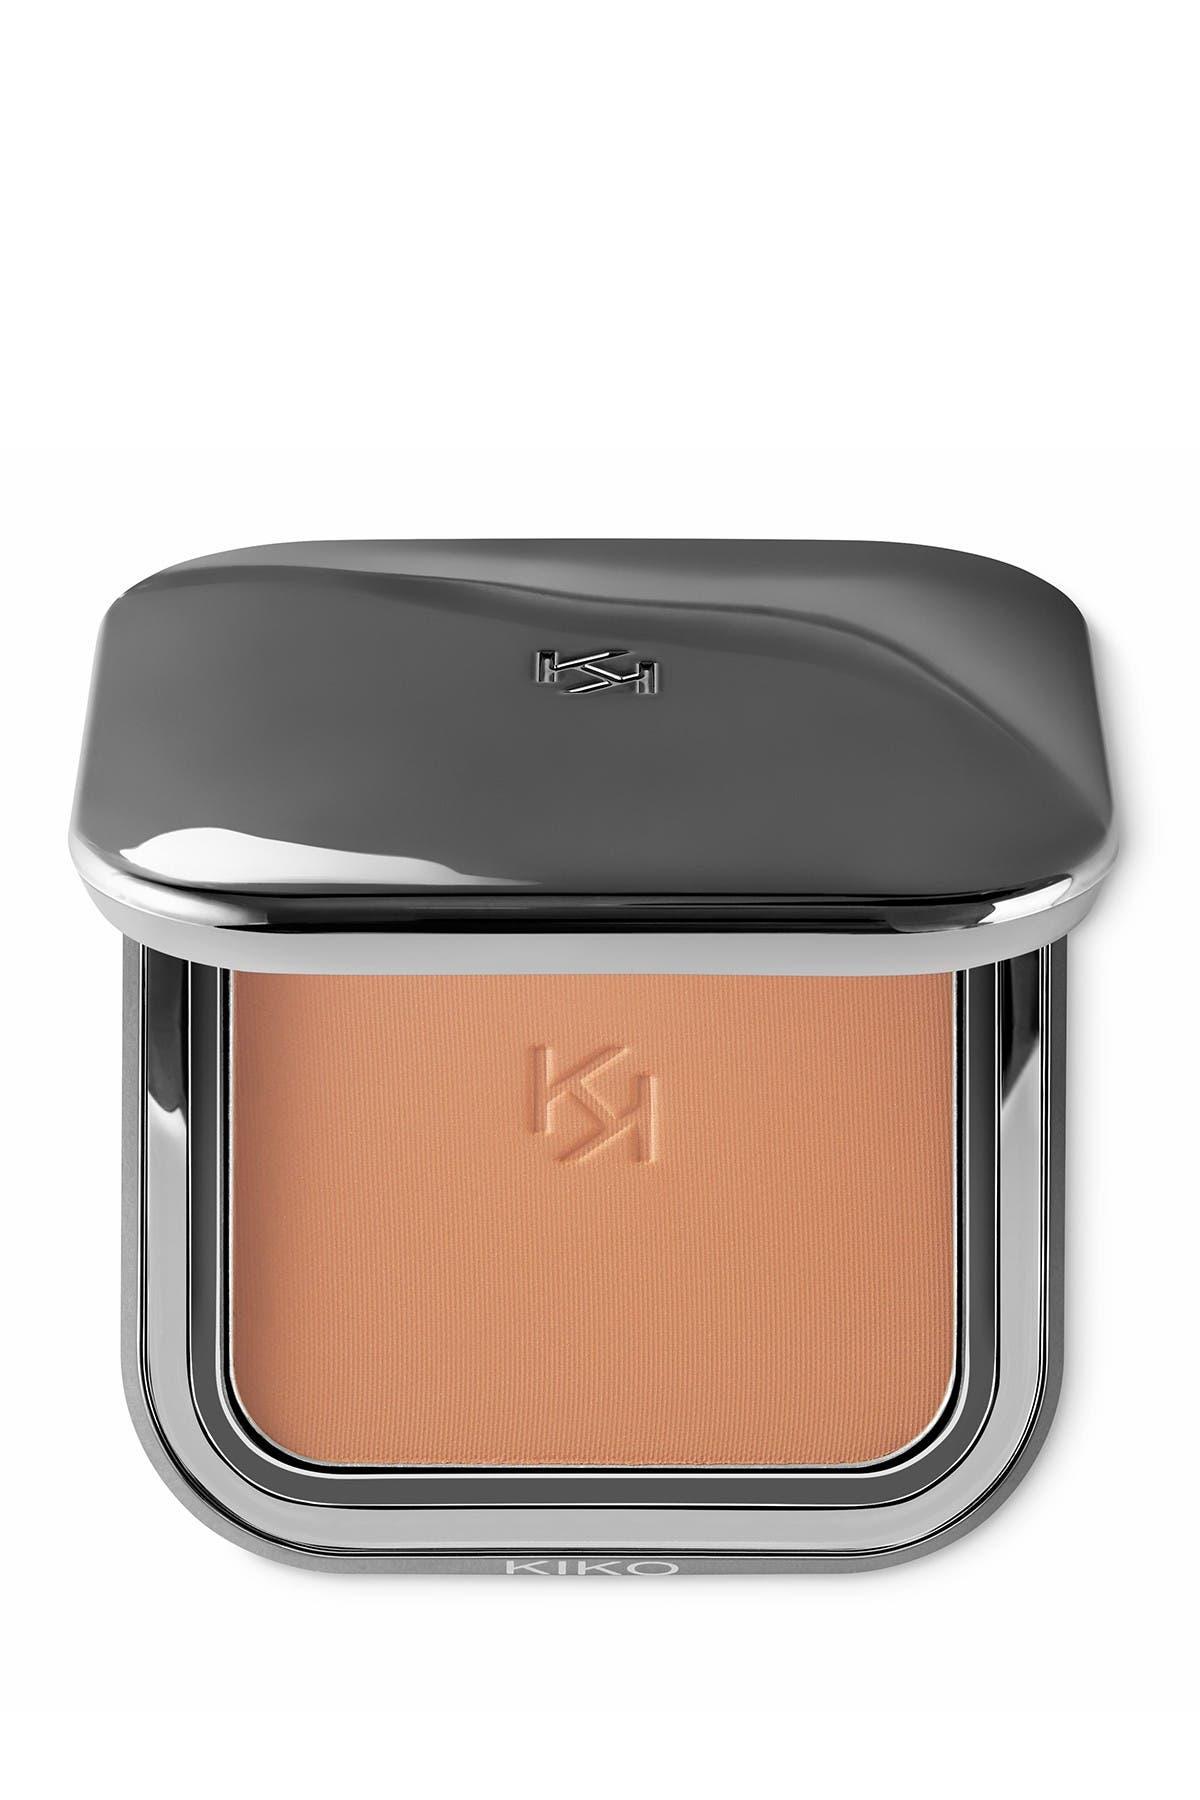 Image of Kiko Milano Flawless Fusion Bronzer Powder - 01 Natural Beige